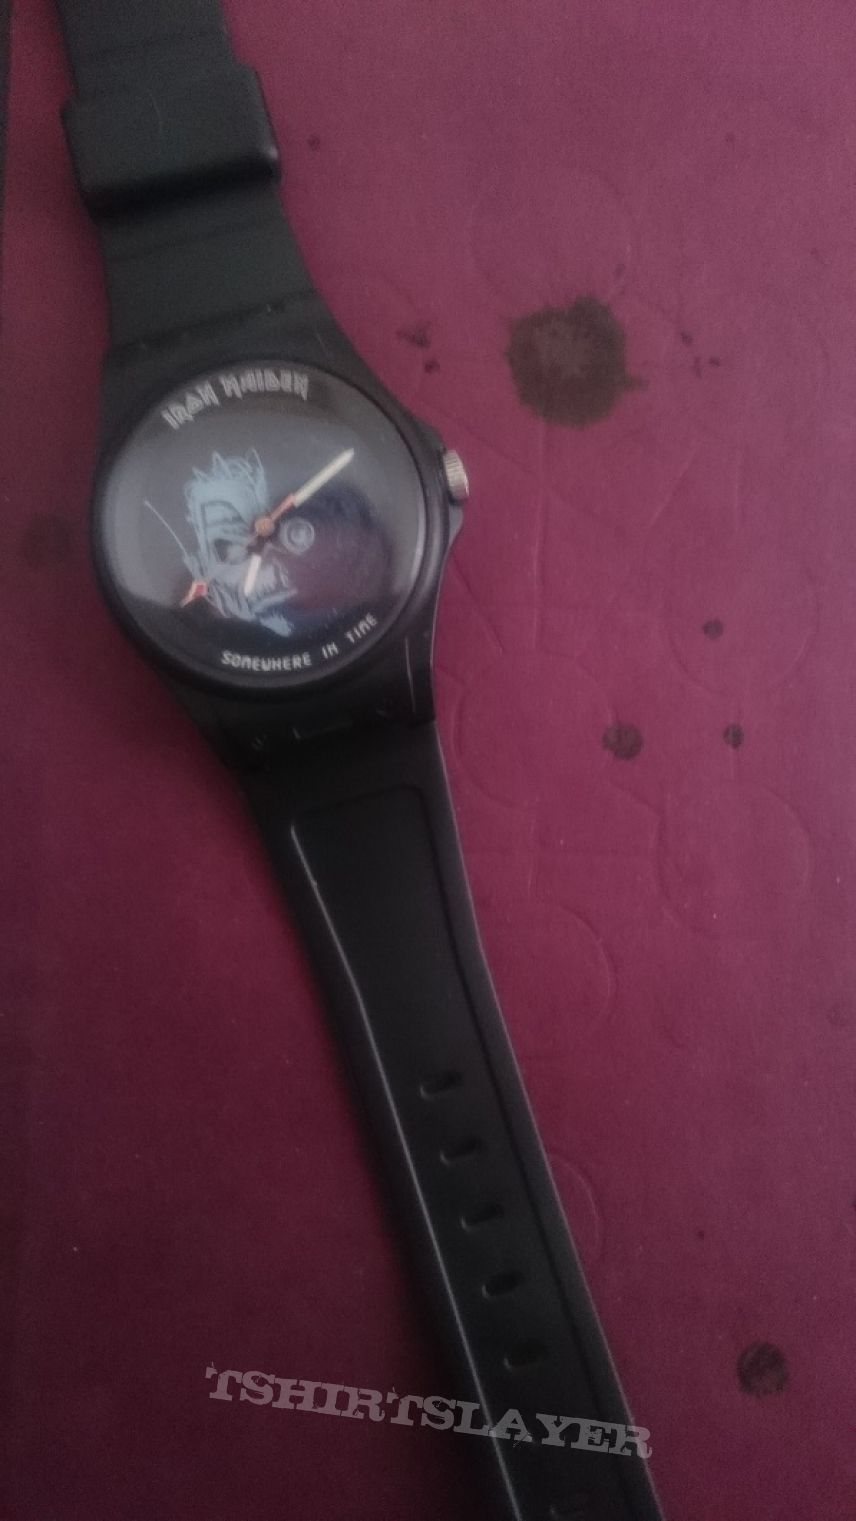 Iron Maiden - Somewhre in time Wristwatch promo 1987